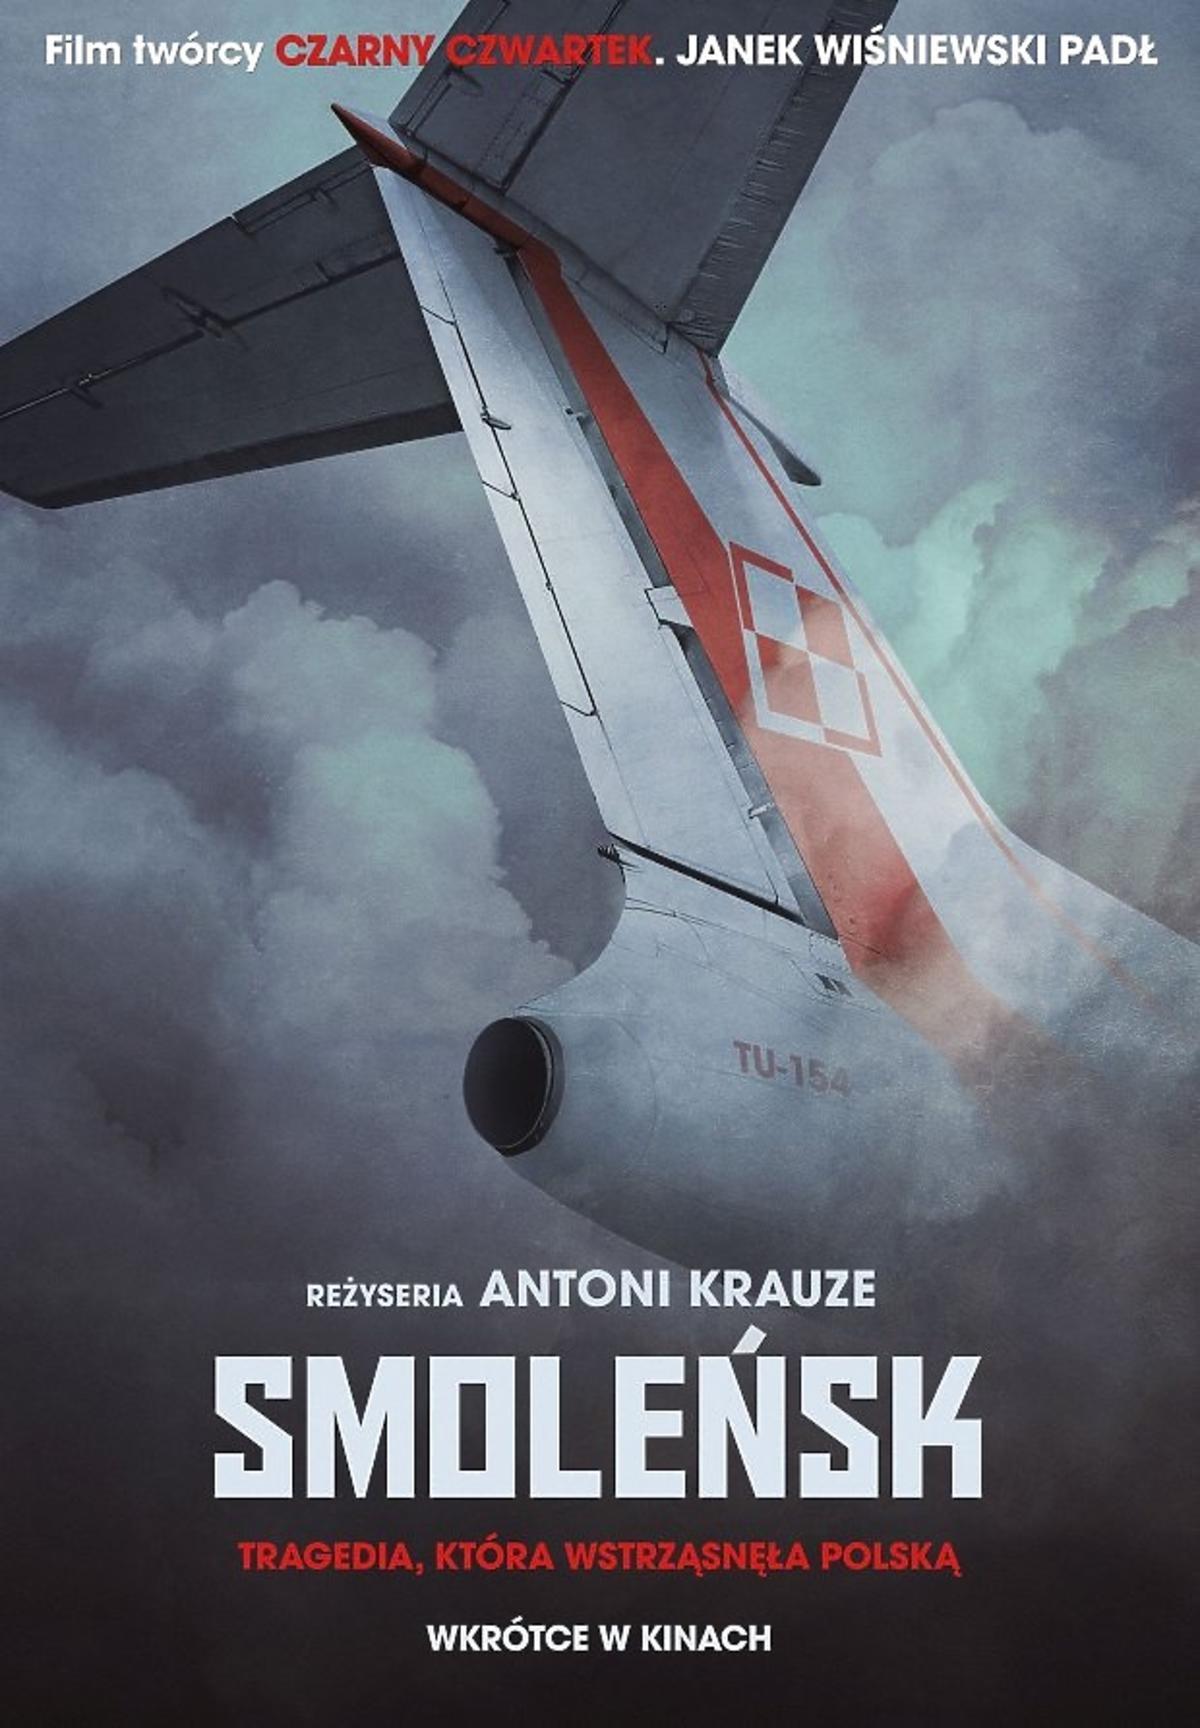 Plakat filmu o katastrofie smoleńskiej